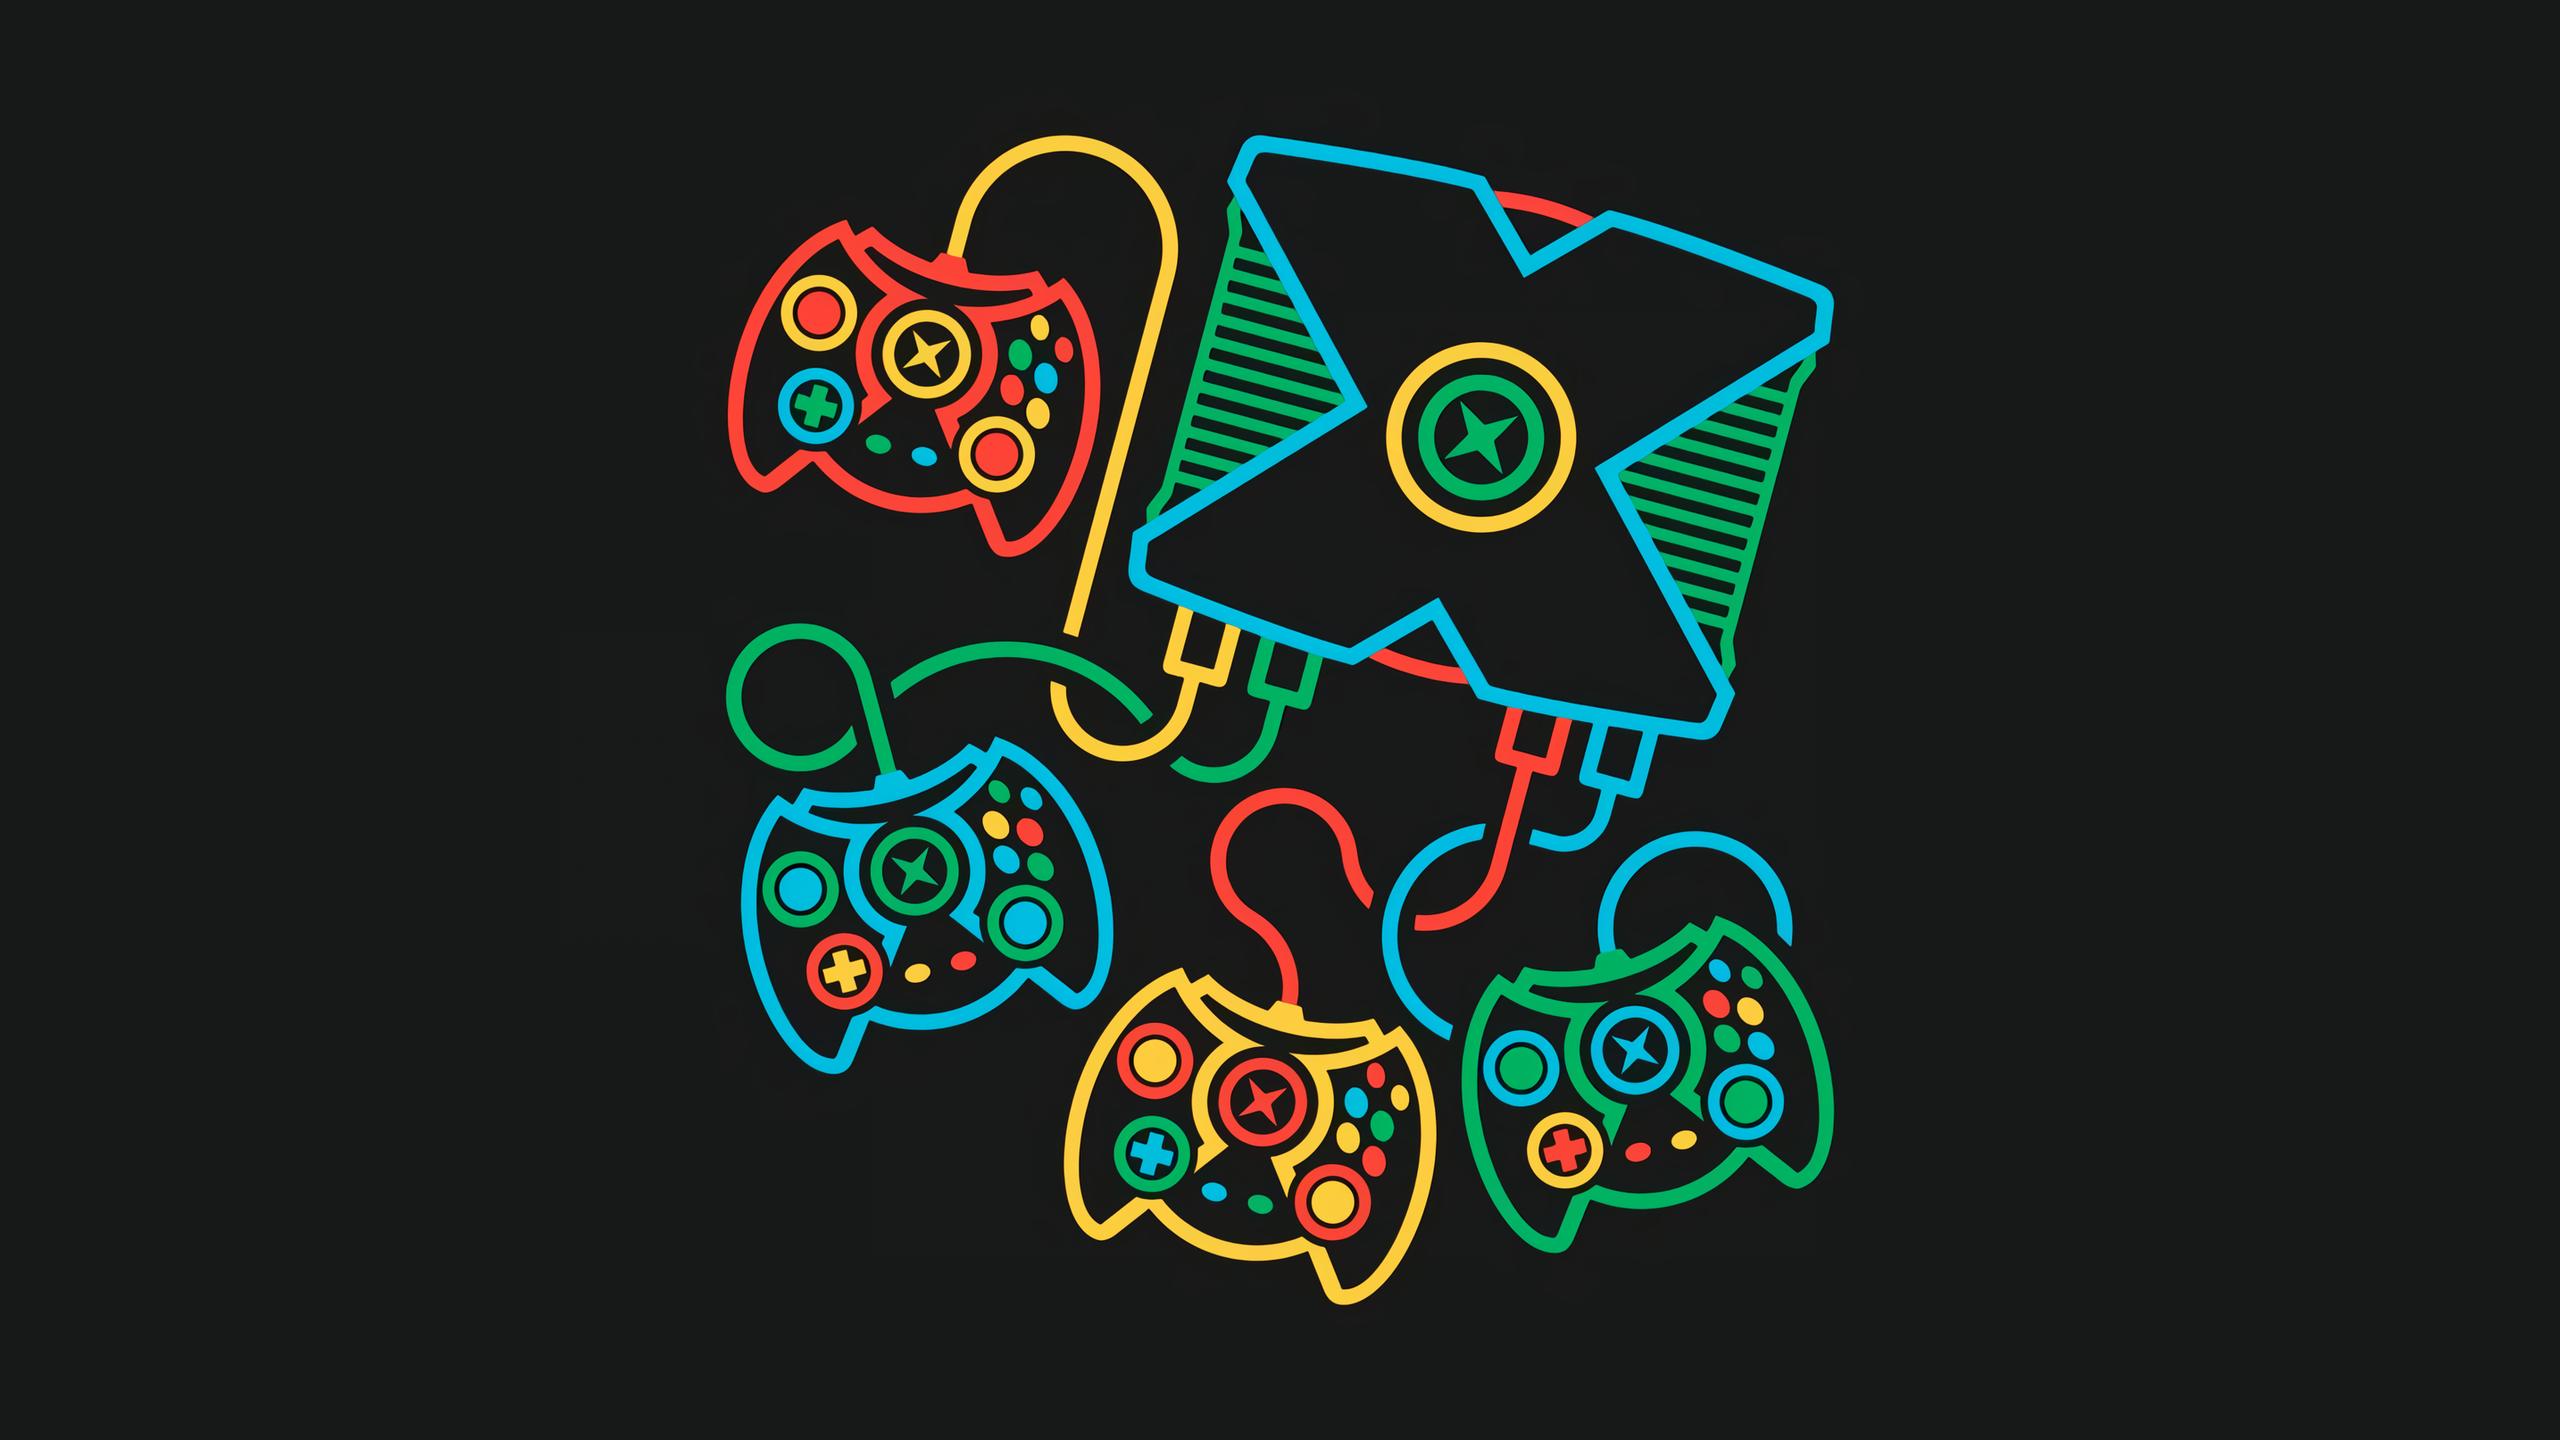 Xbox retro games minimalism black background 1807861